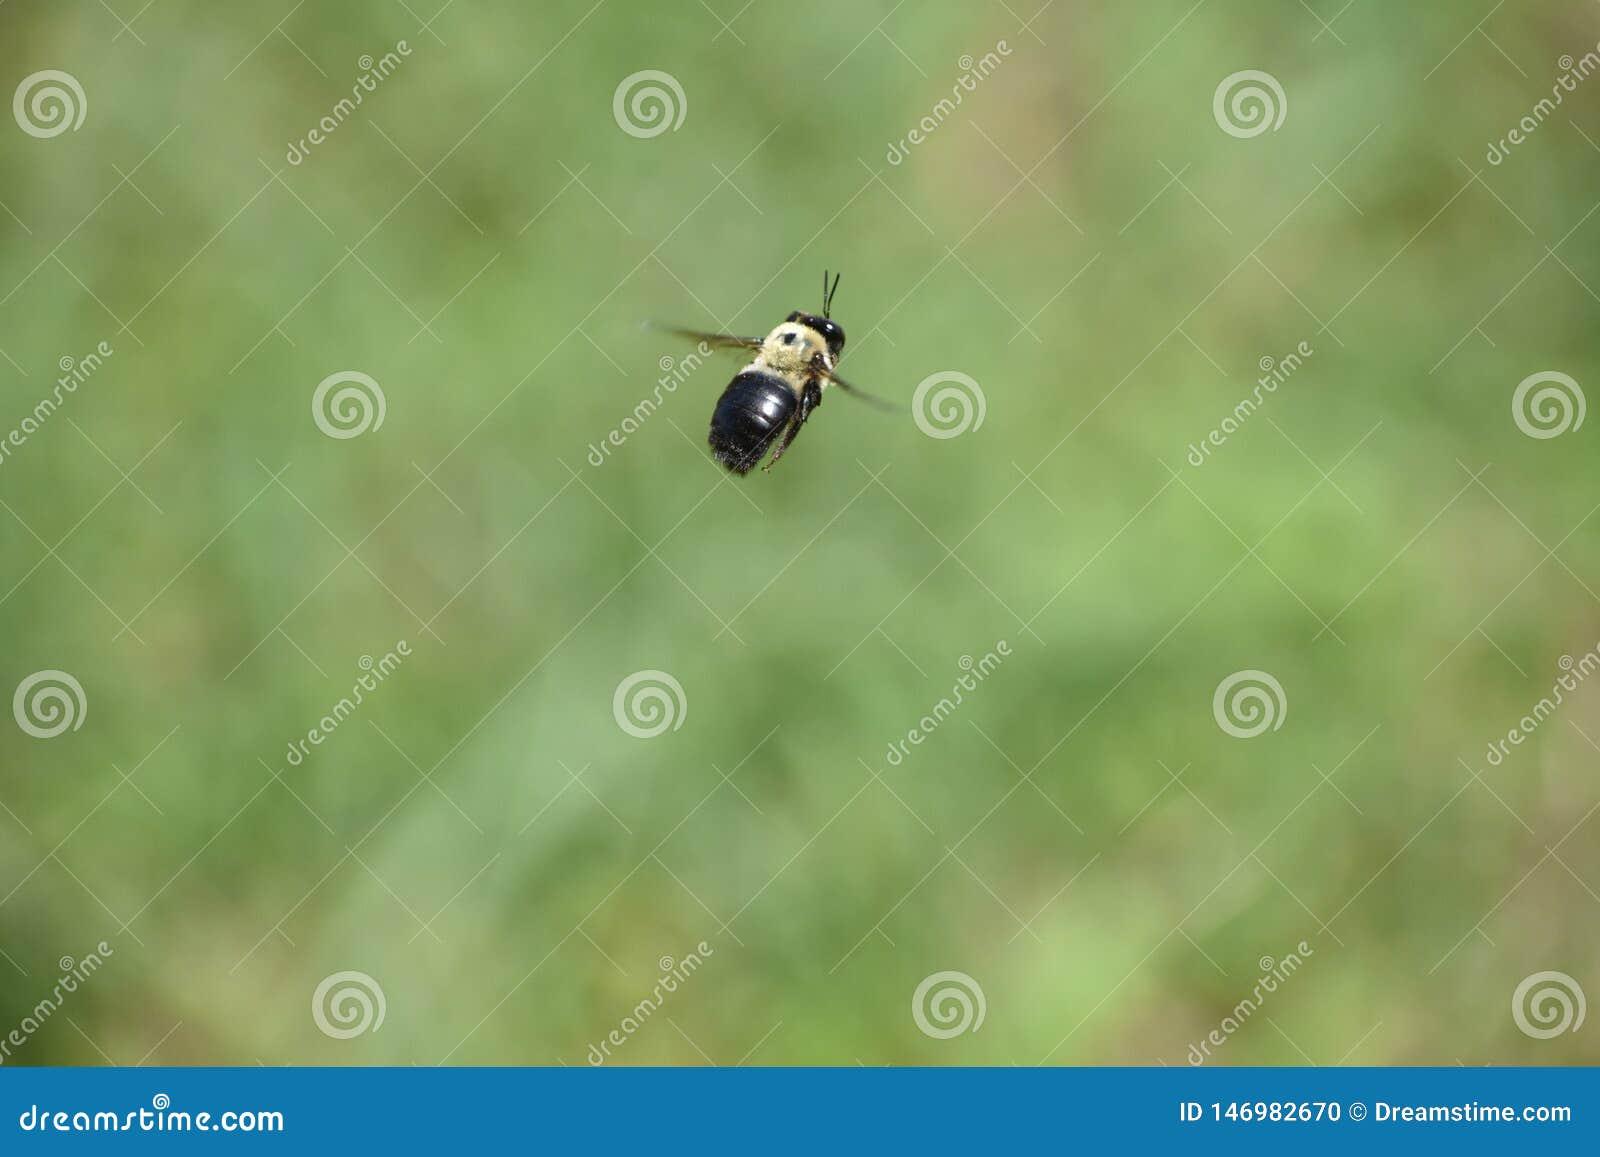 Carpentiere Bee Flying